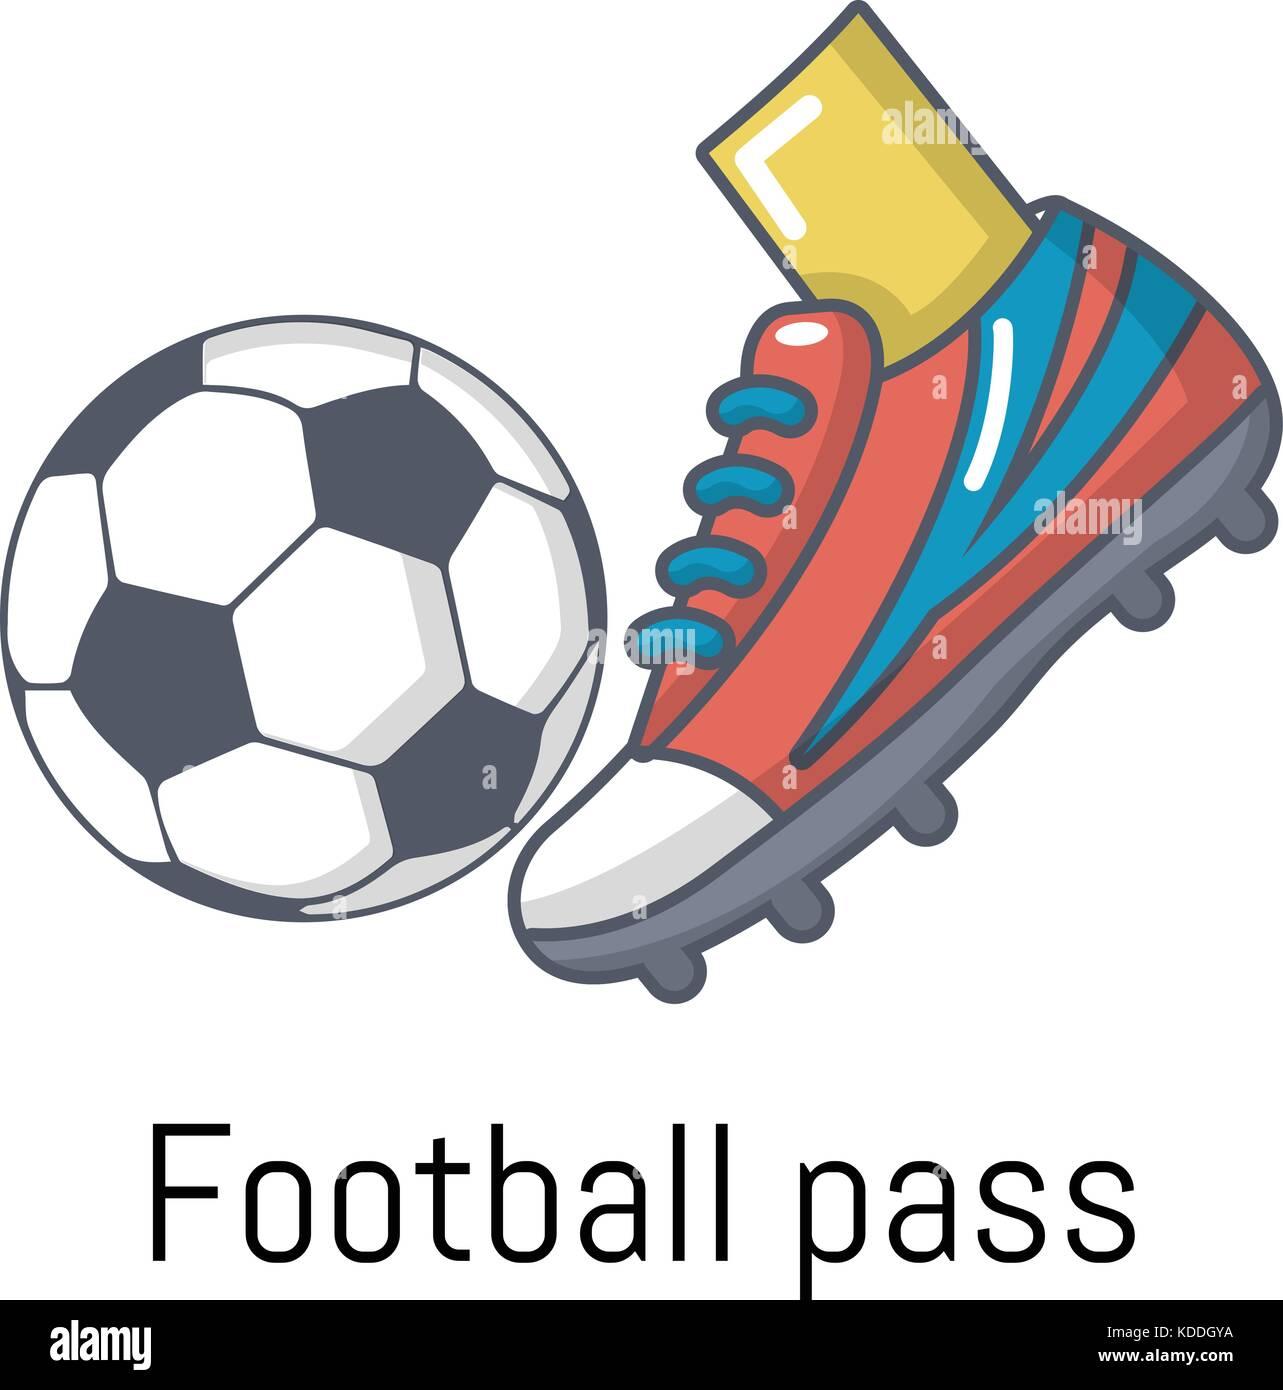 cartoon illustration american football pass stock photos